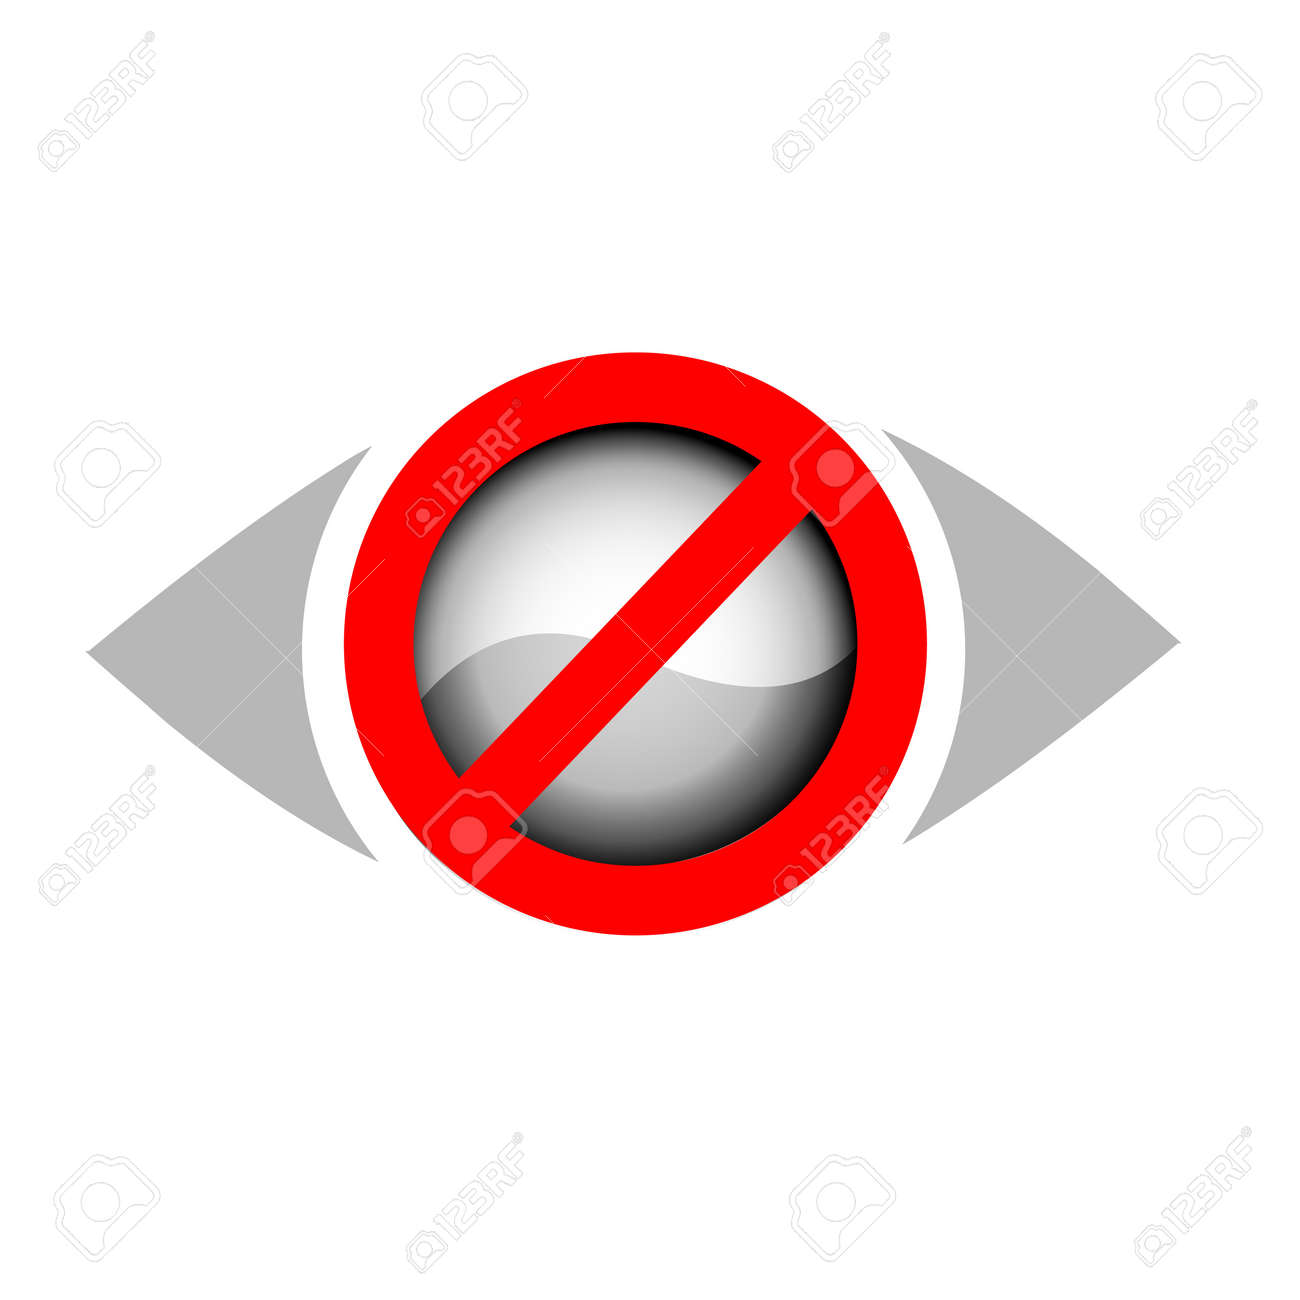 No vision Stock Vector - 19332157